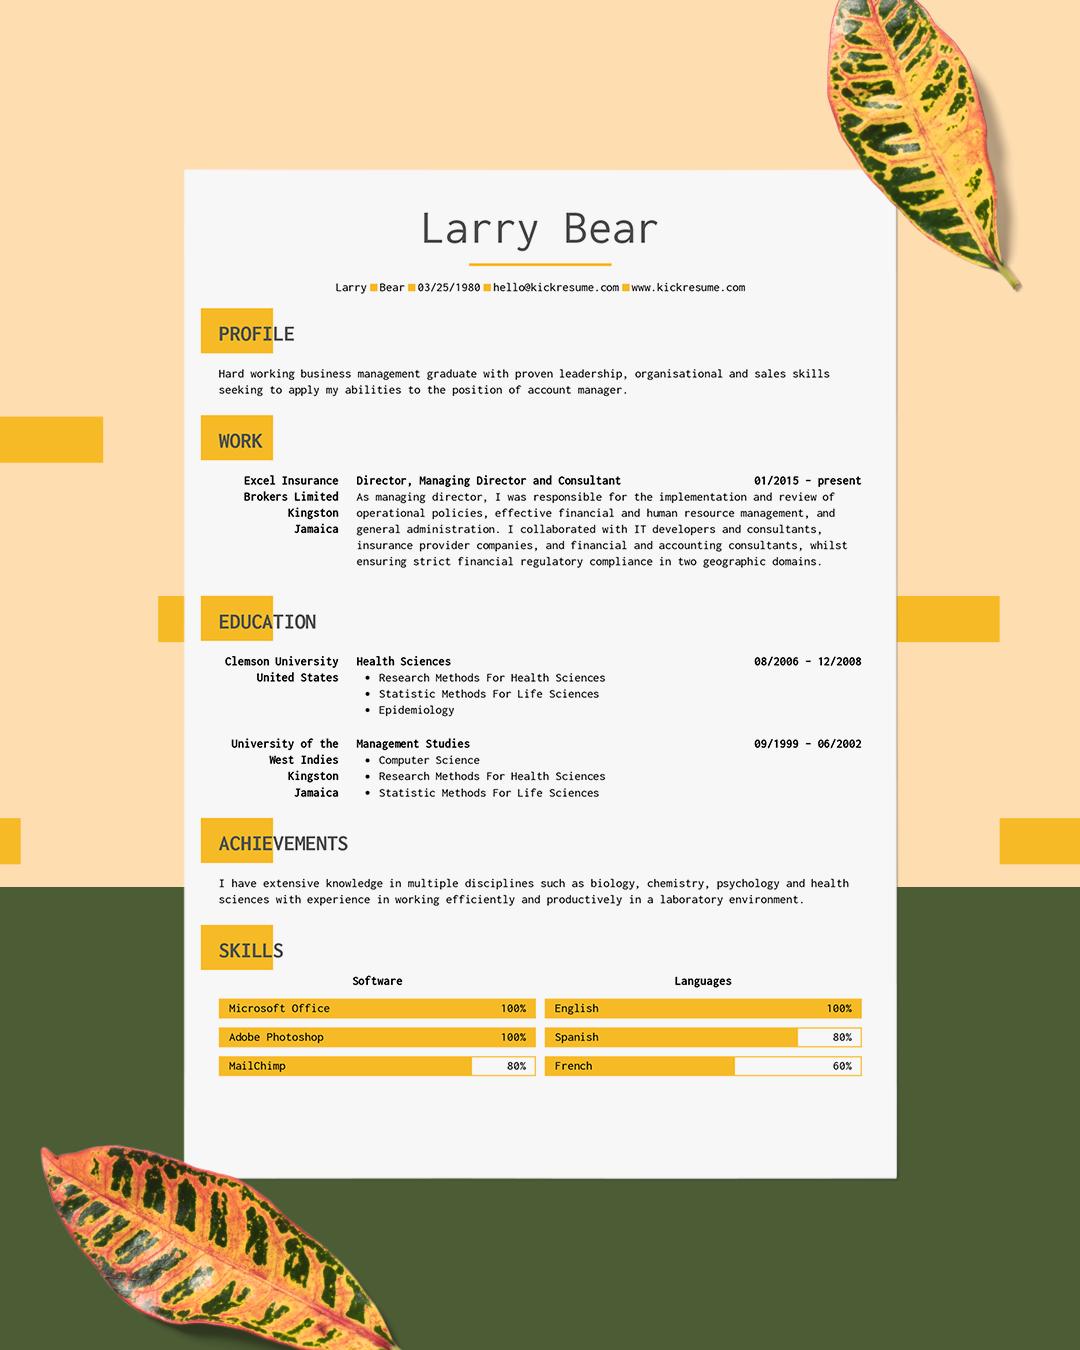 Sales skills image by Kickresume resume builder on